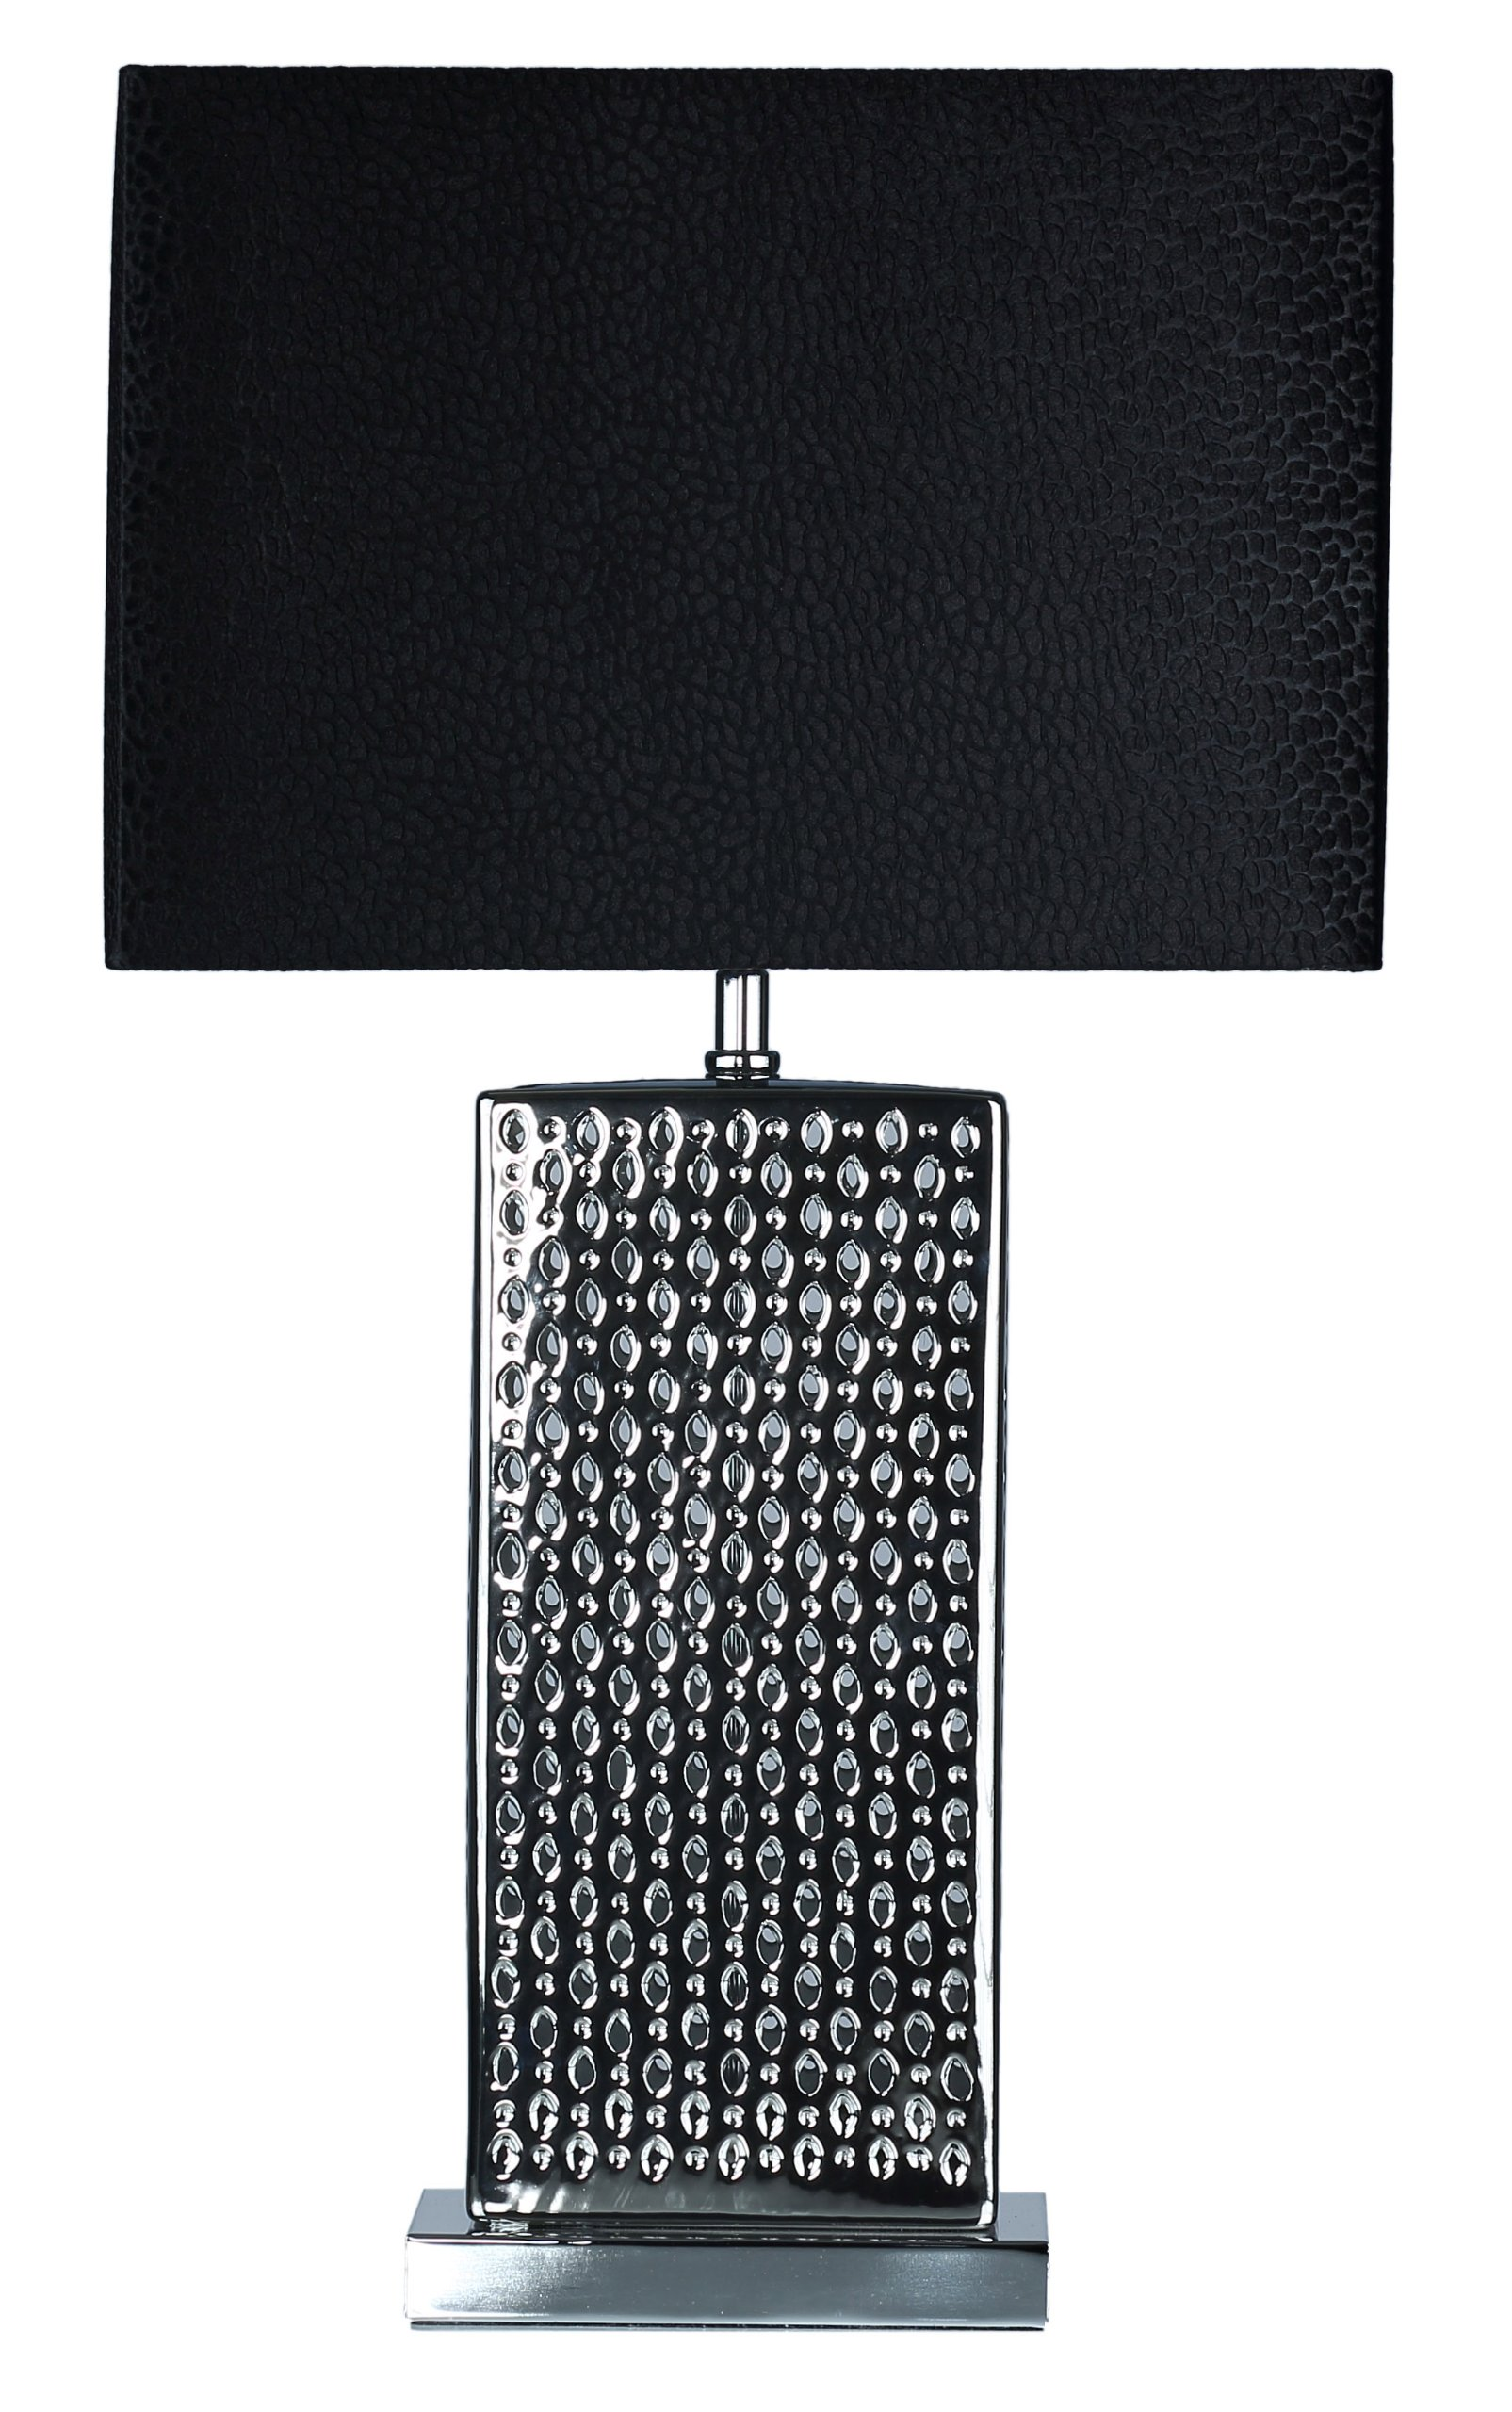 Cortesi Home CH-TL303129 Urban Hive Chrome Accent Lamp with Black Velvet Shade, Chrome